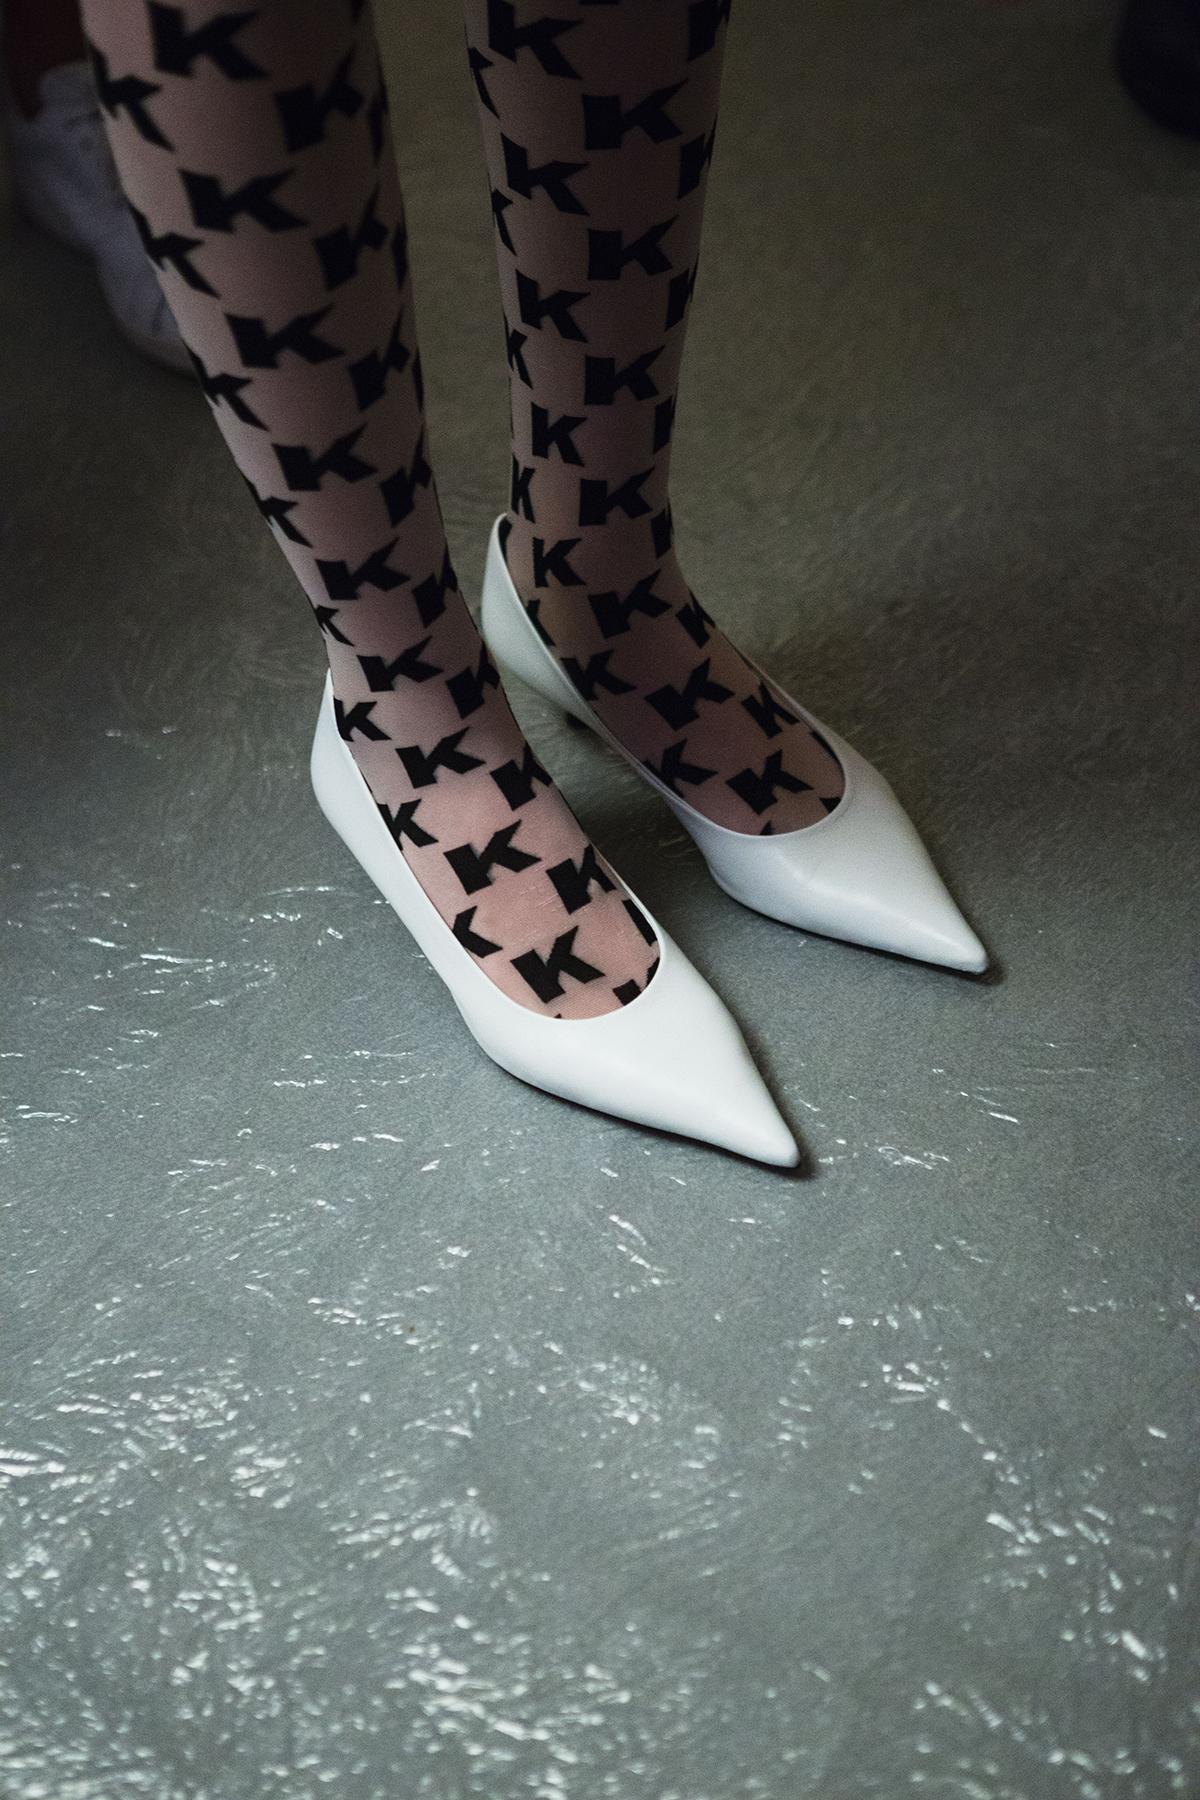 15_kappa_runway_editorial_fashion_federica_borgato